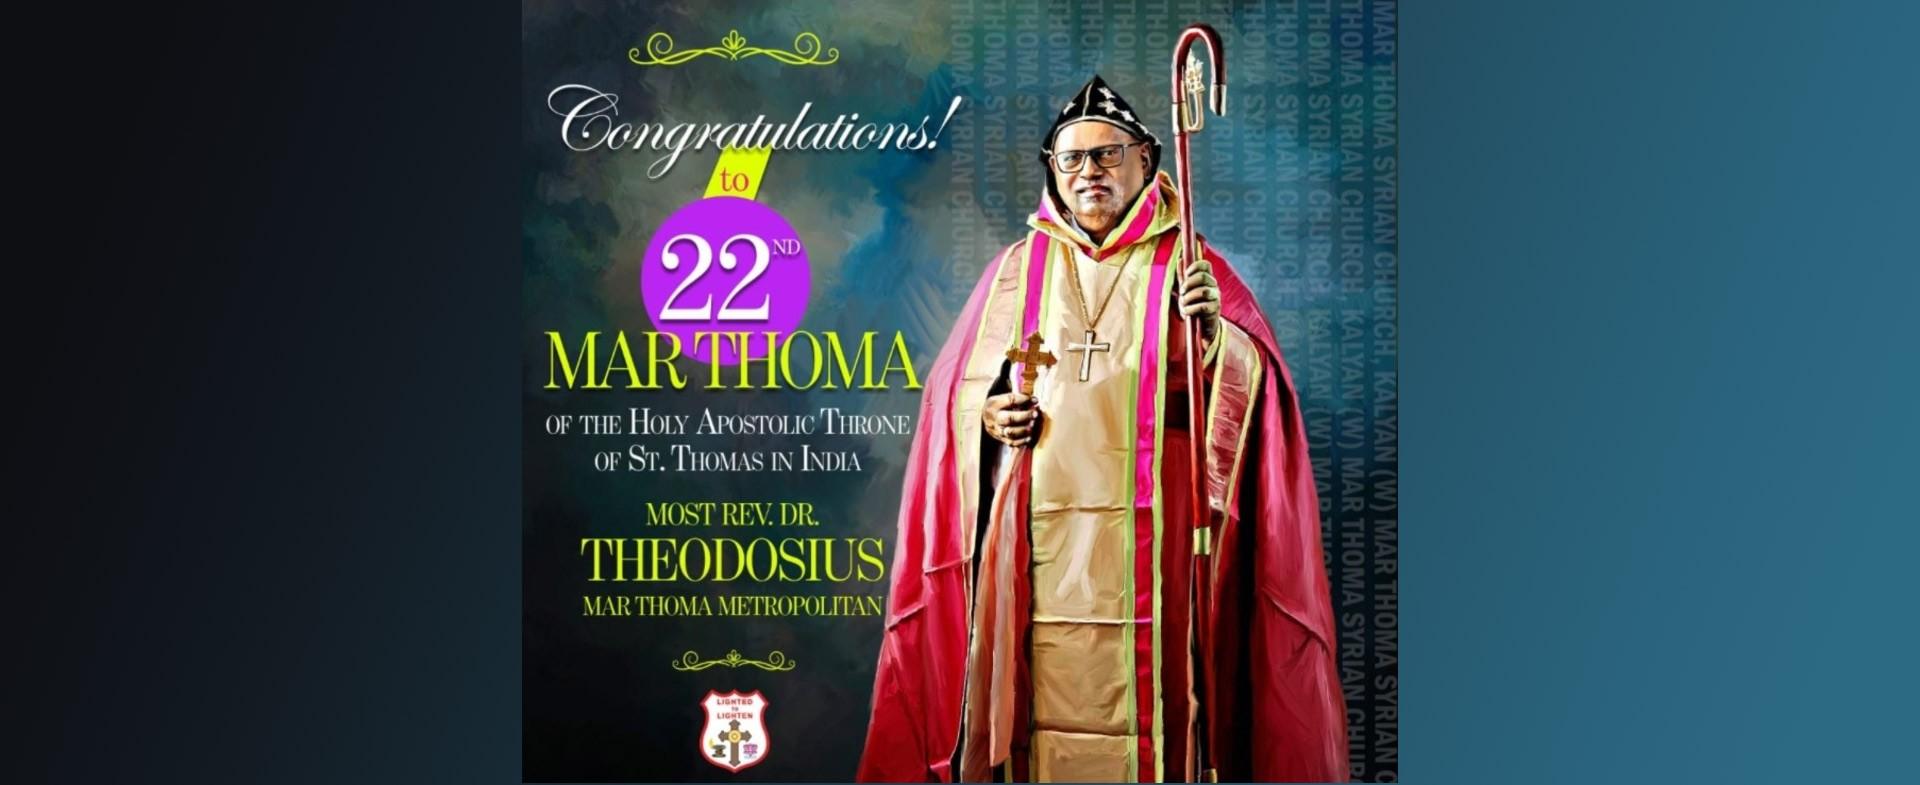 22nd Mar Thoma Metropolitan